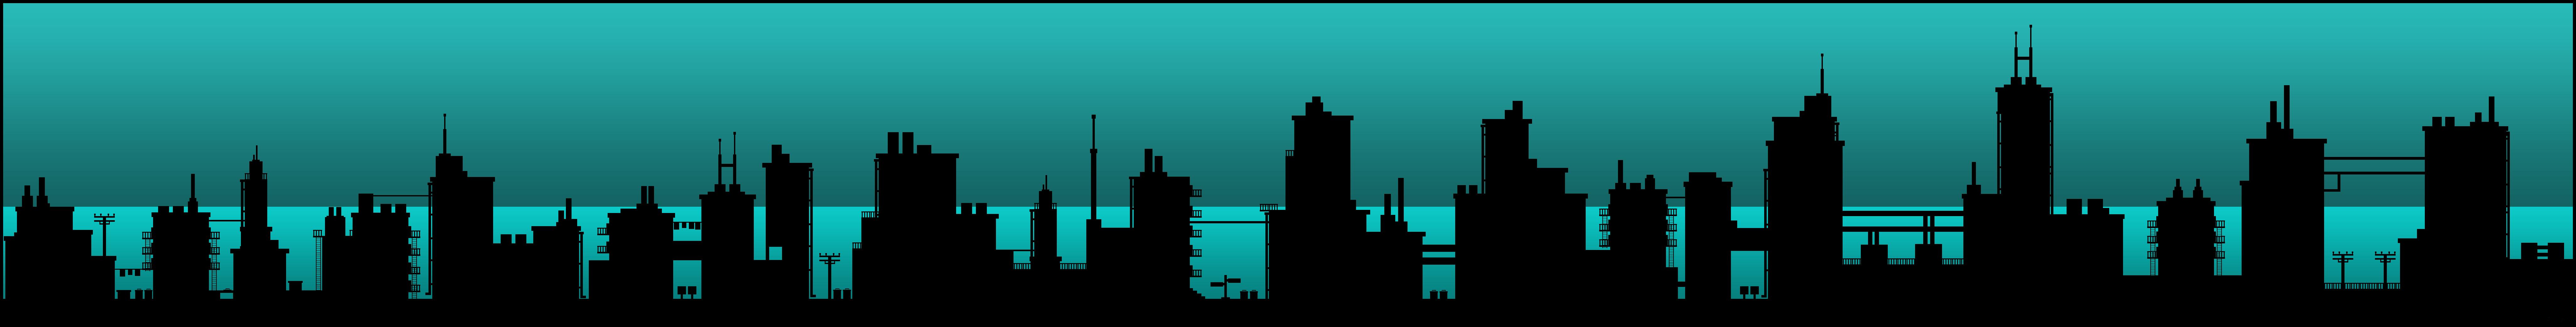 city-construction